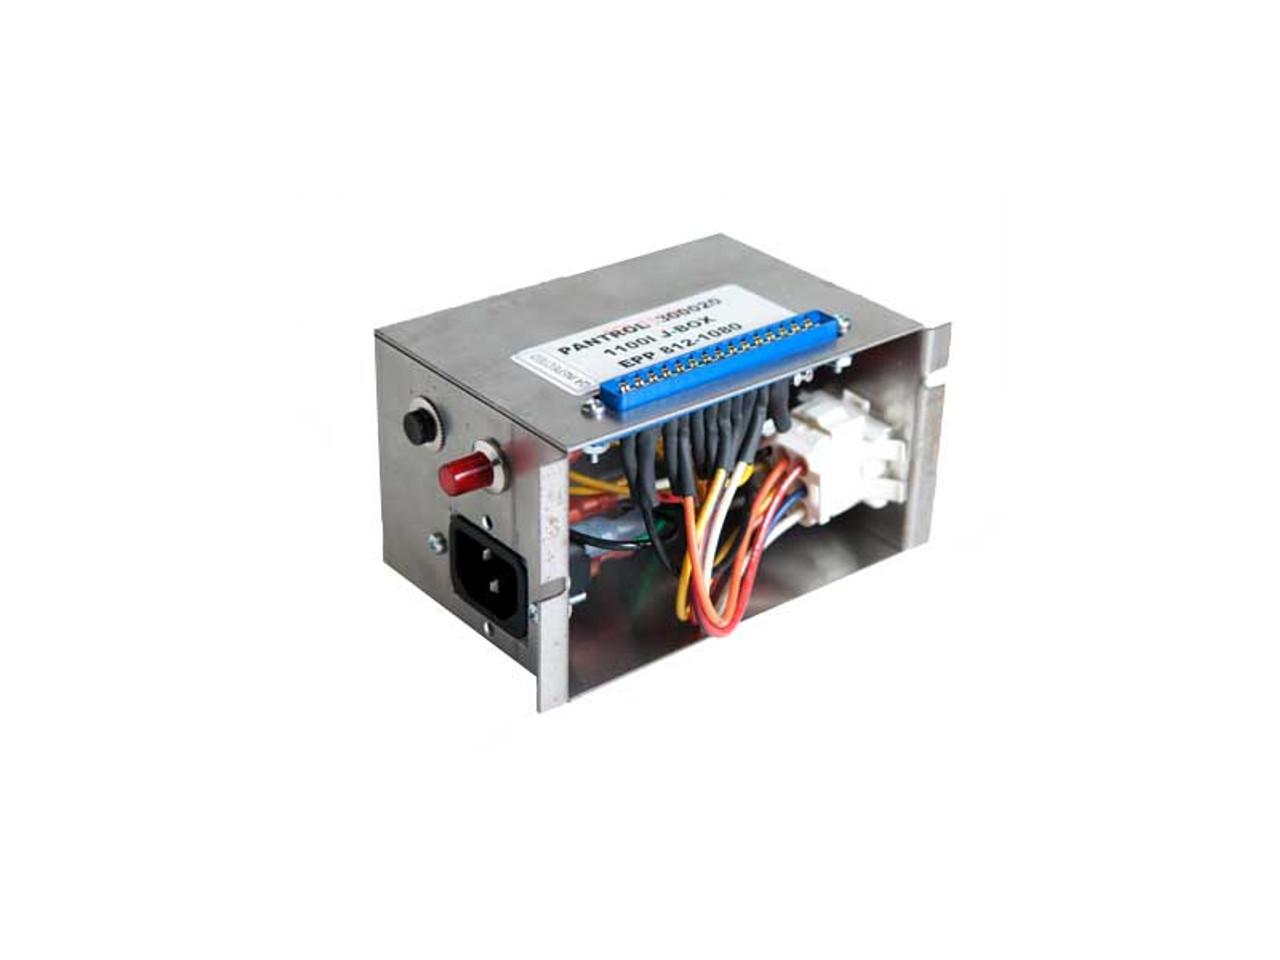 Quadrafire 1100i Junction Box (812-1080)